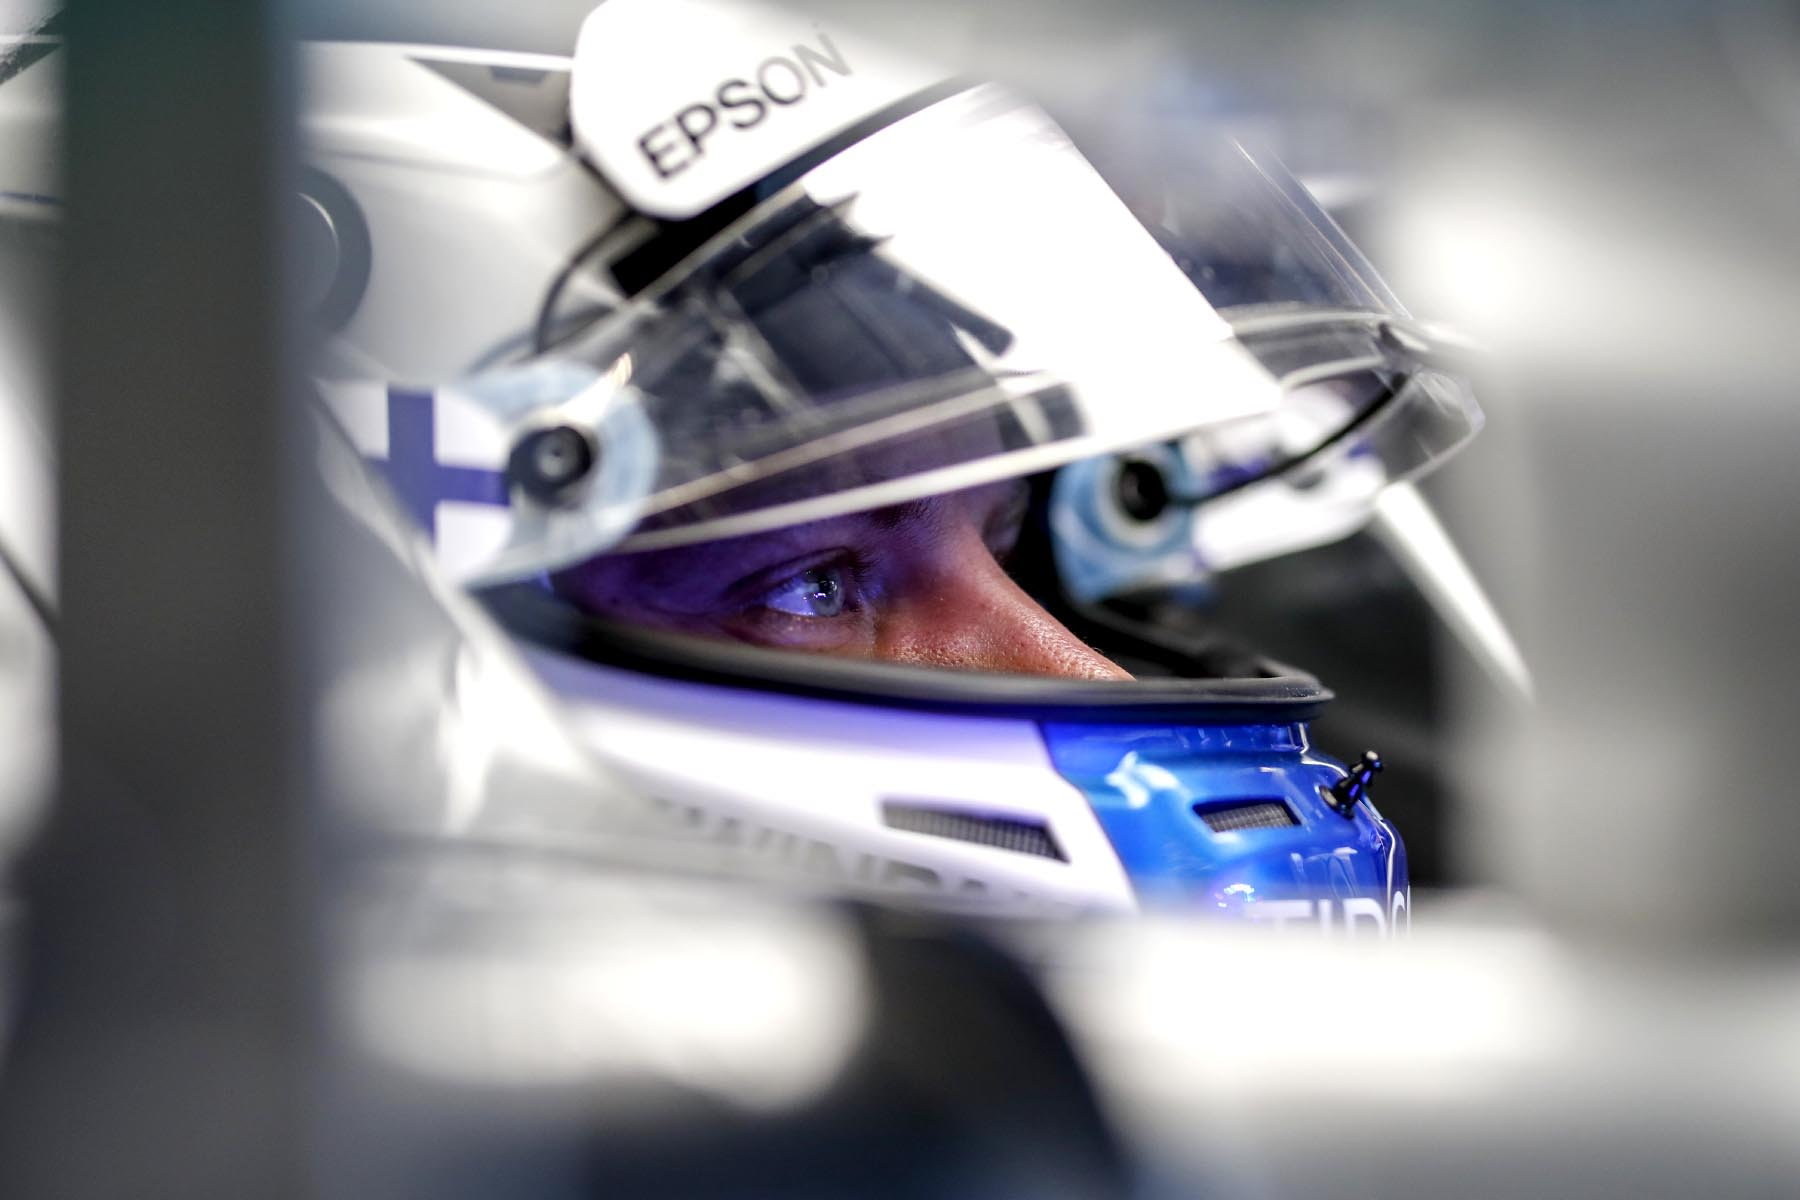 Valtteri Bottas in his car at the 2018 United States Grand Prix.